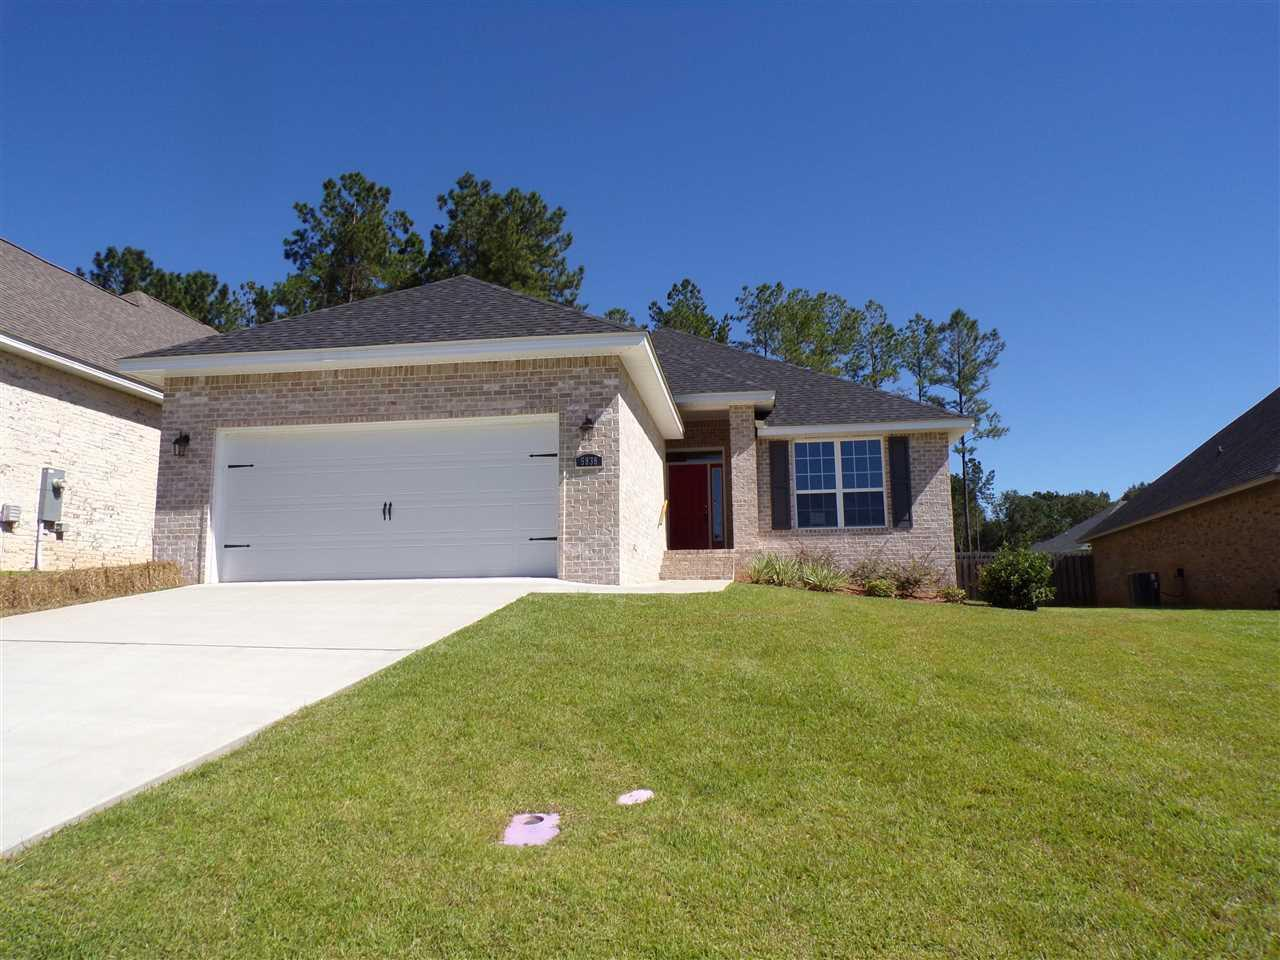 5838 Dunridge Dr, Pace, FL 32571